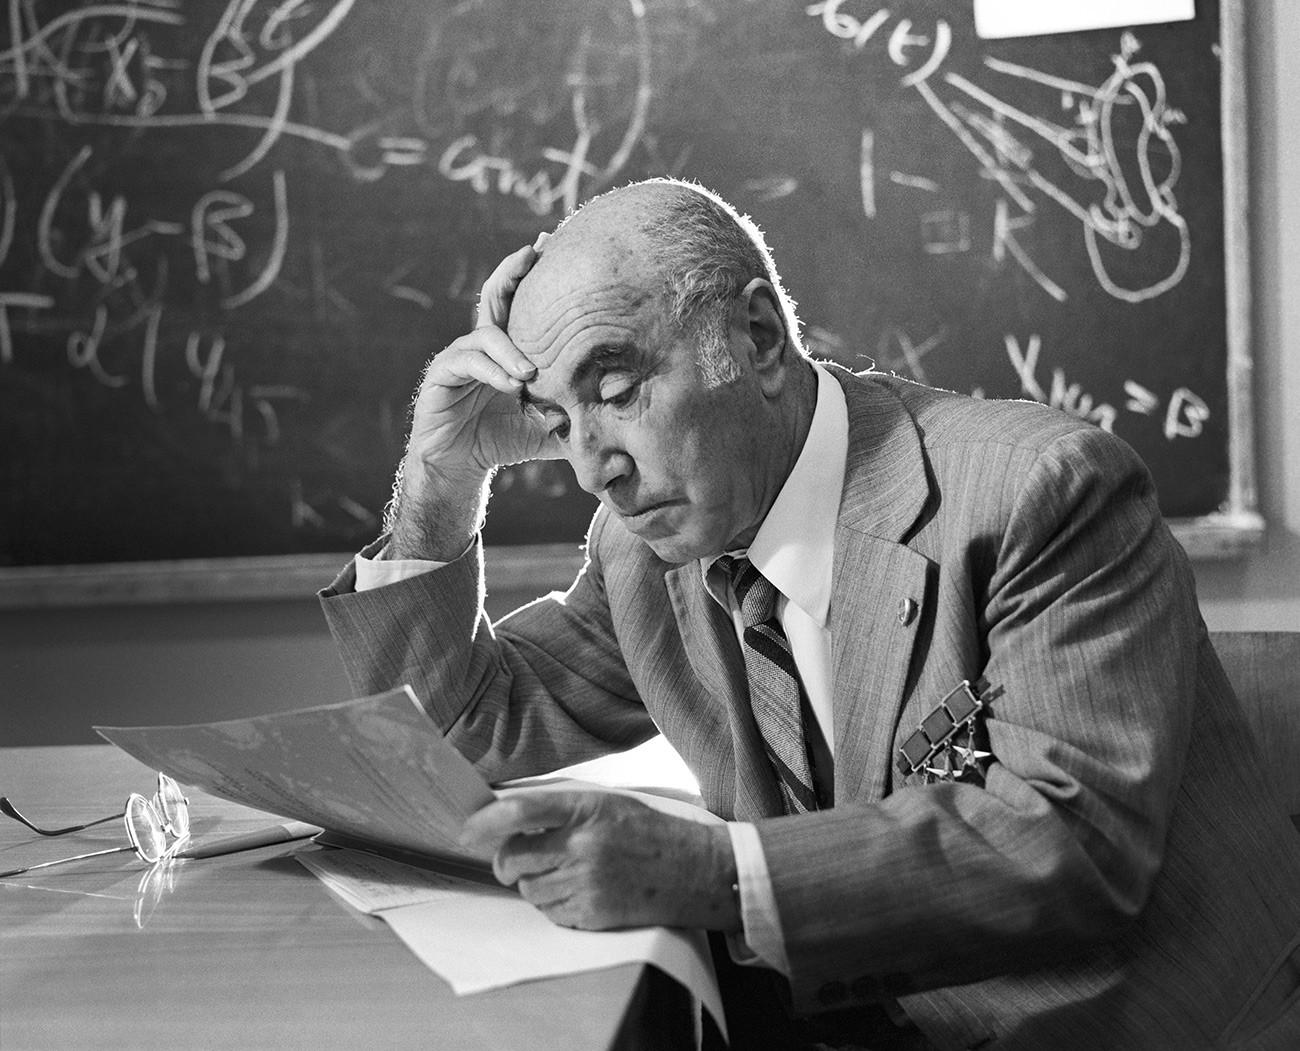 Sovjetski stručnjak za fiziku i fizičku kemiju, akademik Jakov Zeljdovič.